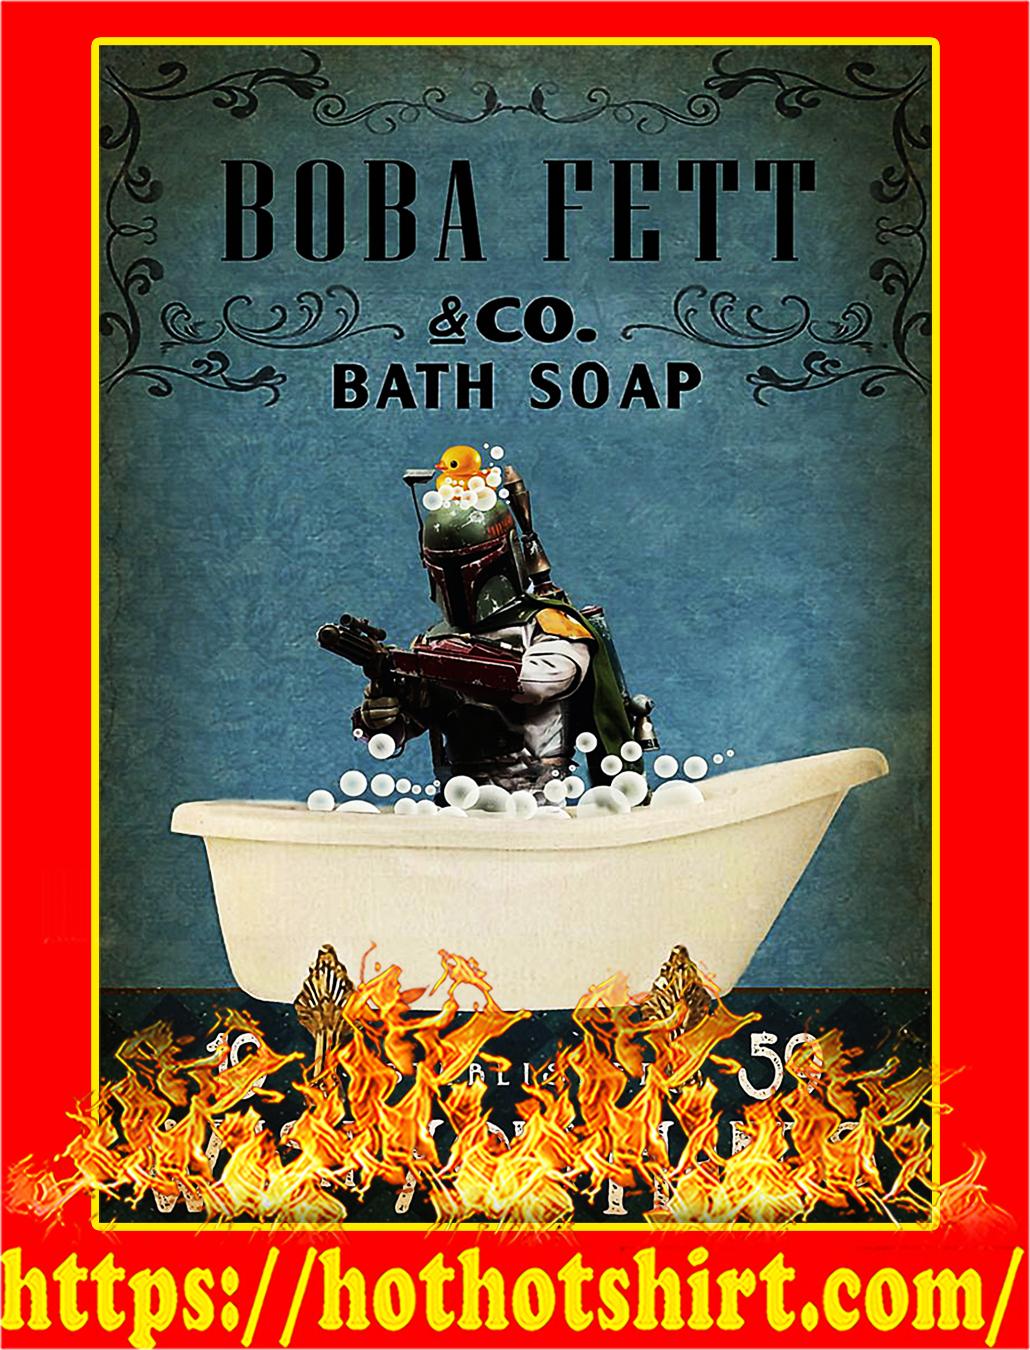 Bath soap company boba bett wash your hands poster - A4